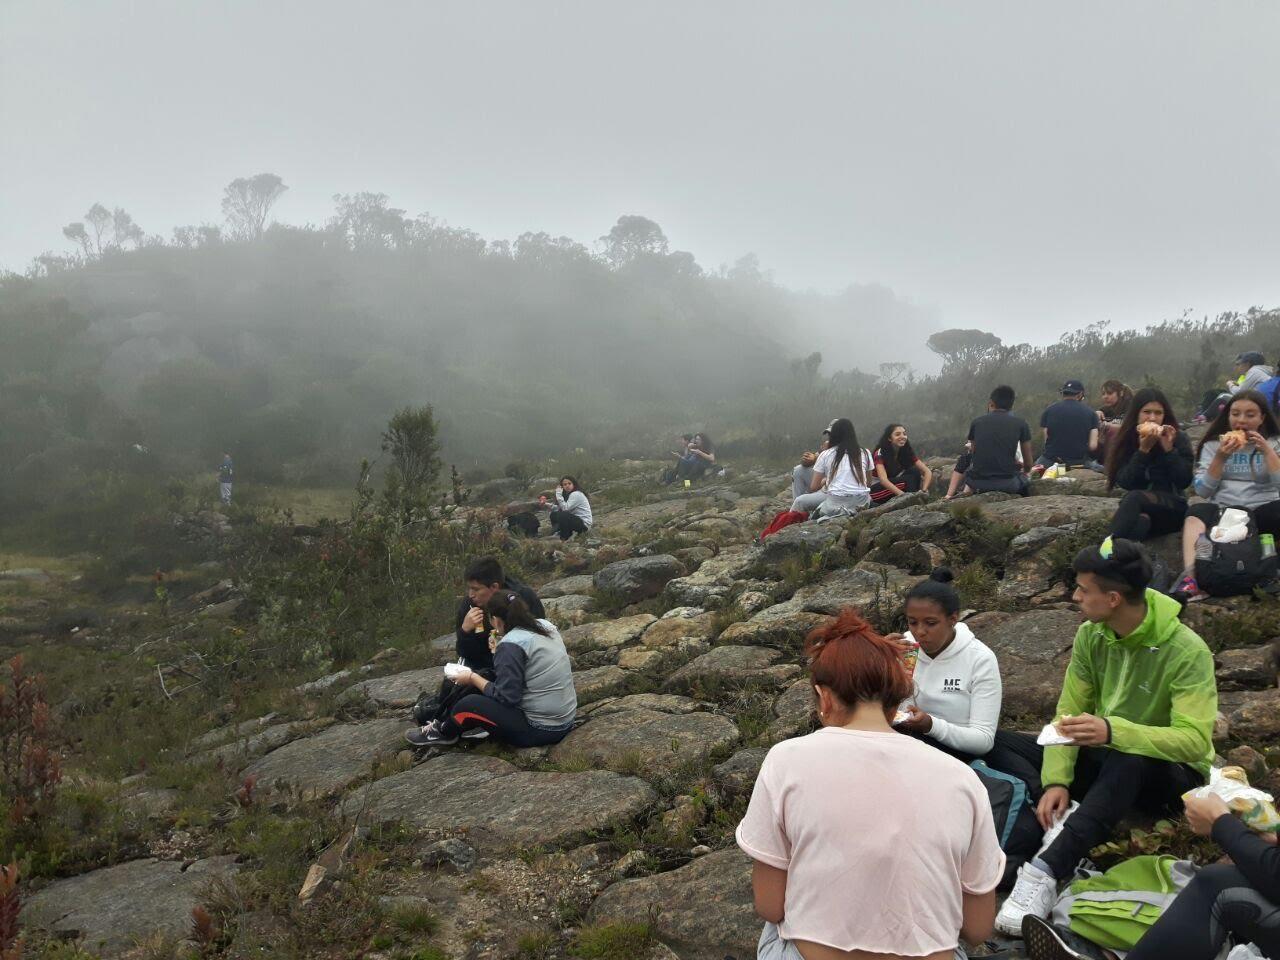 Cerro el tablazo